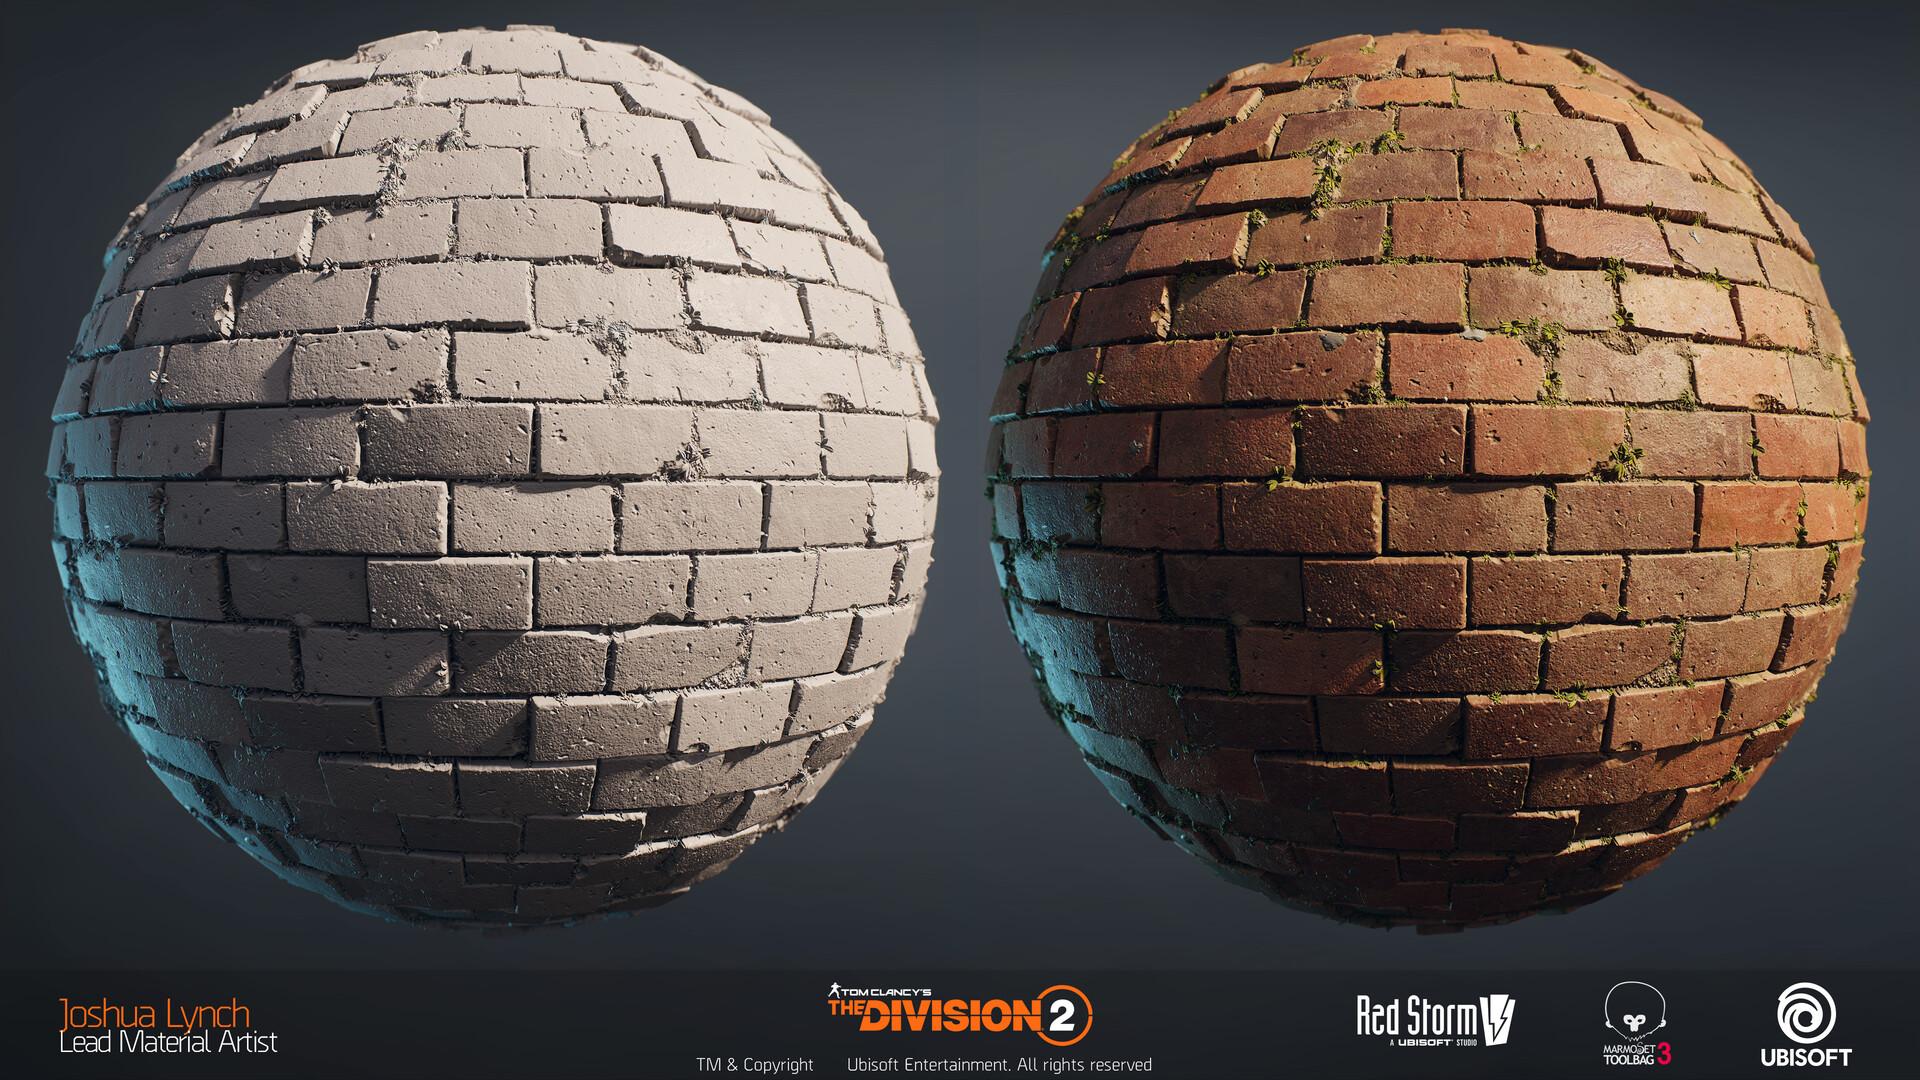 Joshua lynch division 2 josh lynch brick